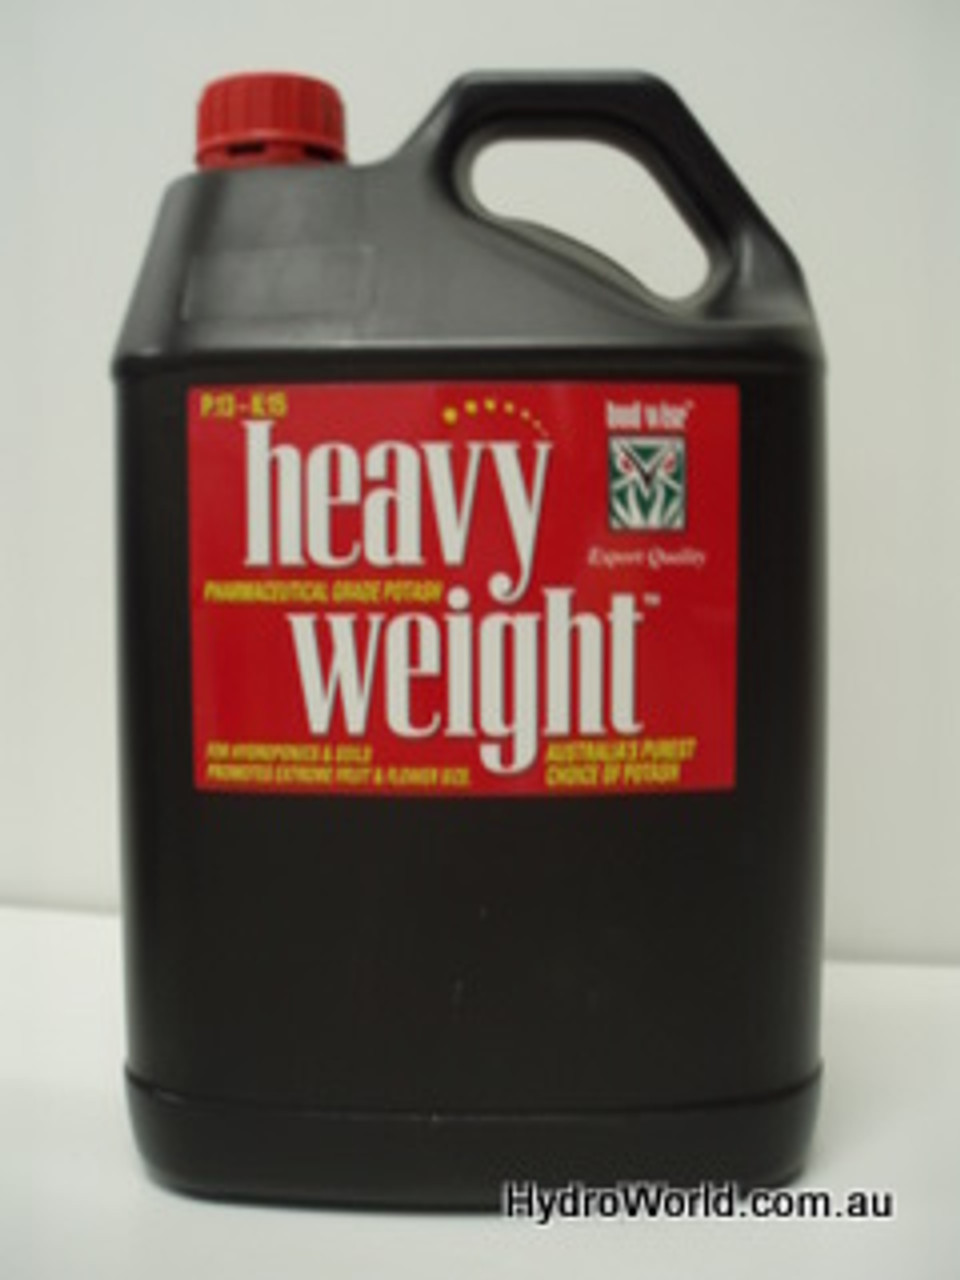 Heavy Weight Potash 5L